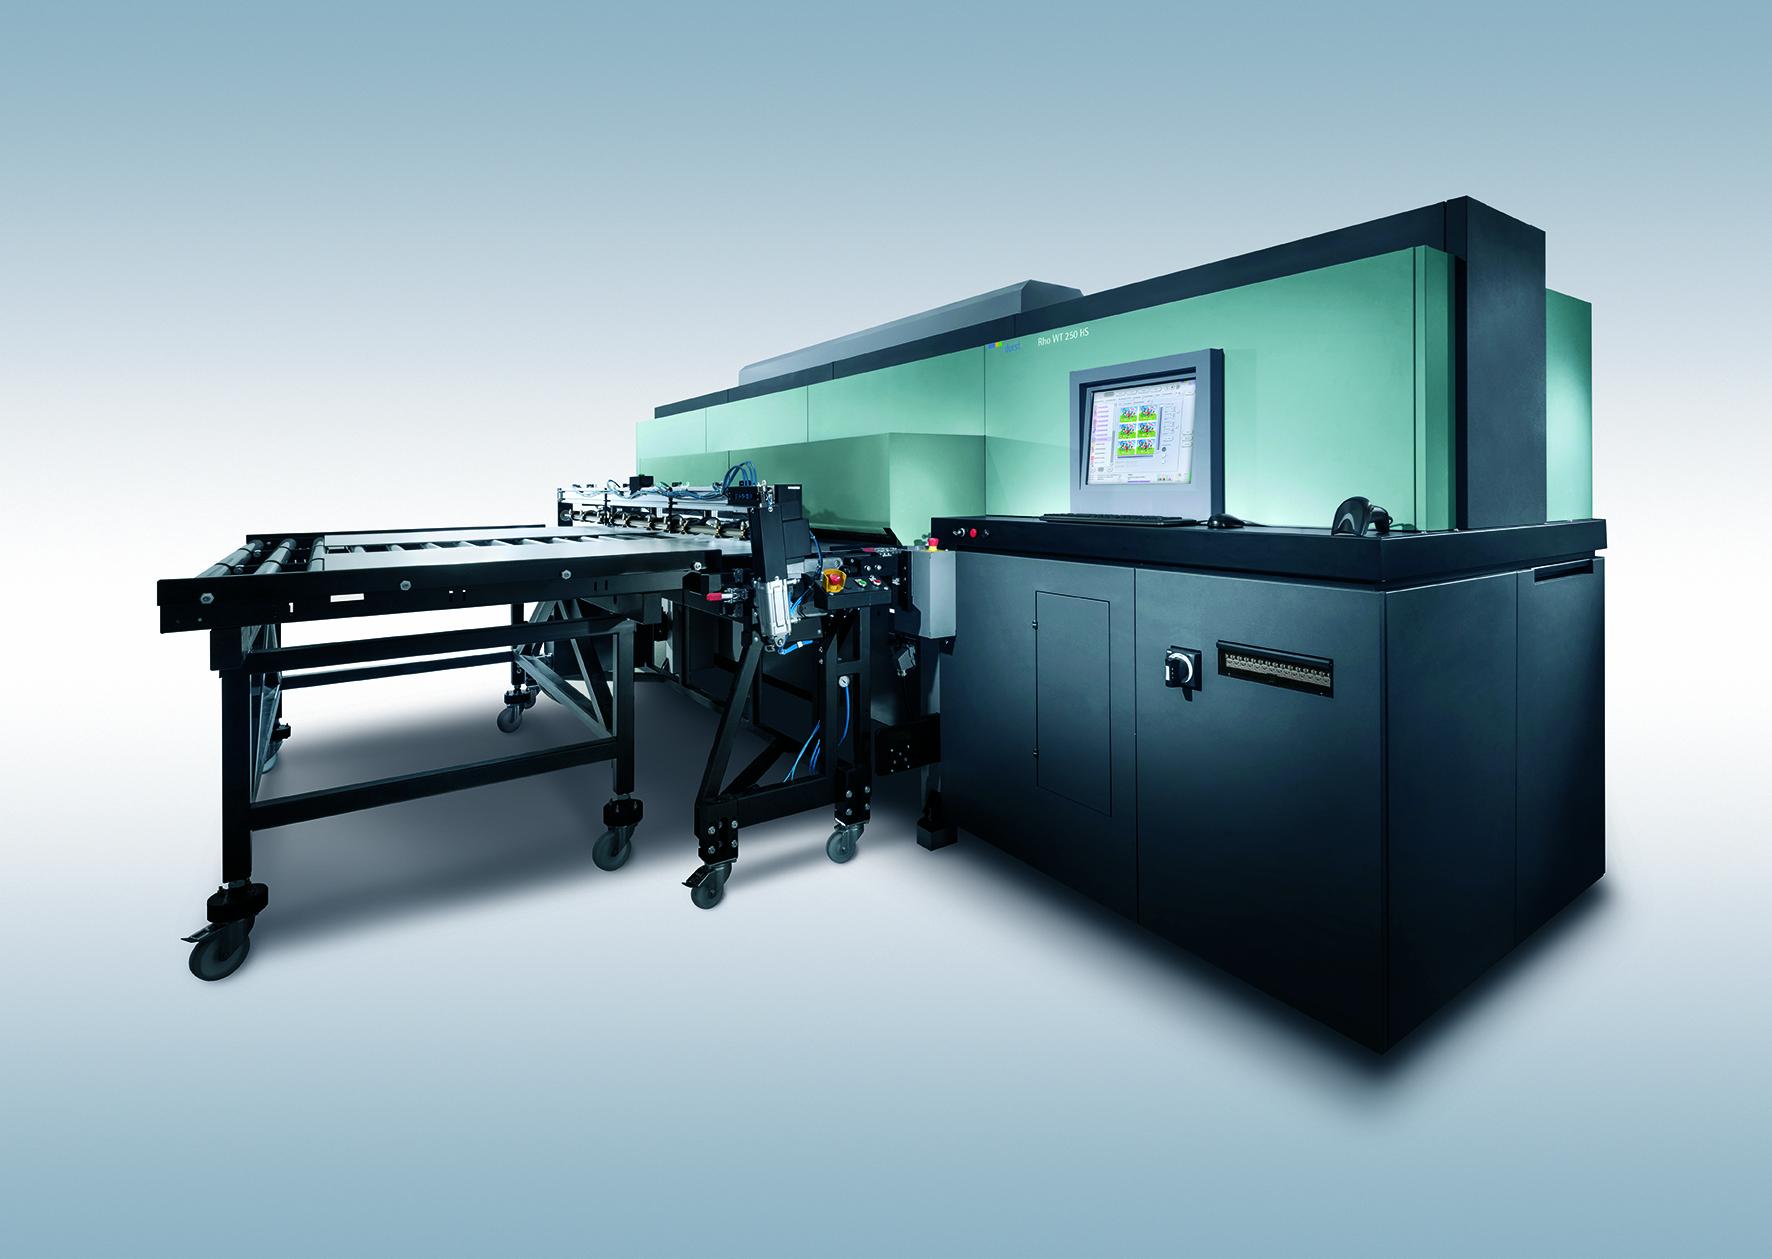 Rho WT 250 HS-4C-Press